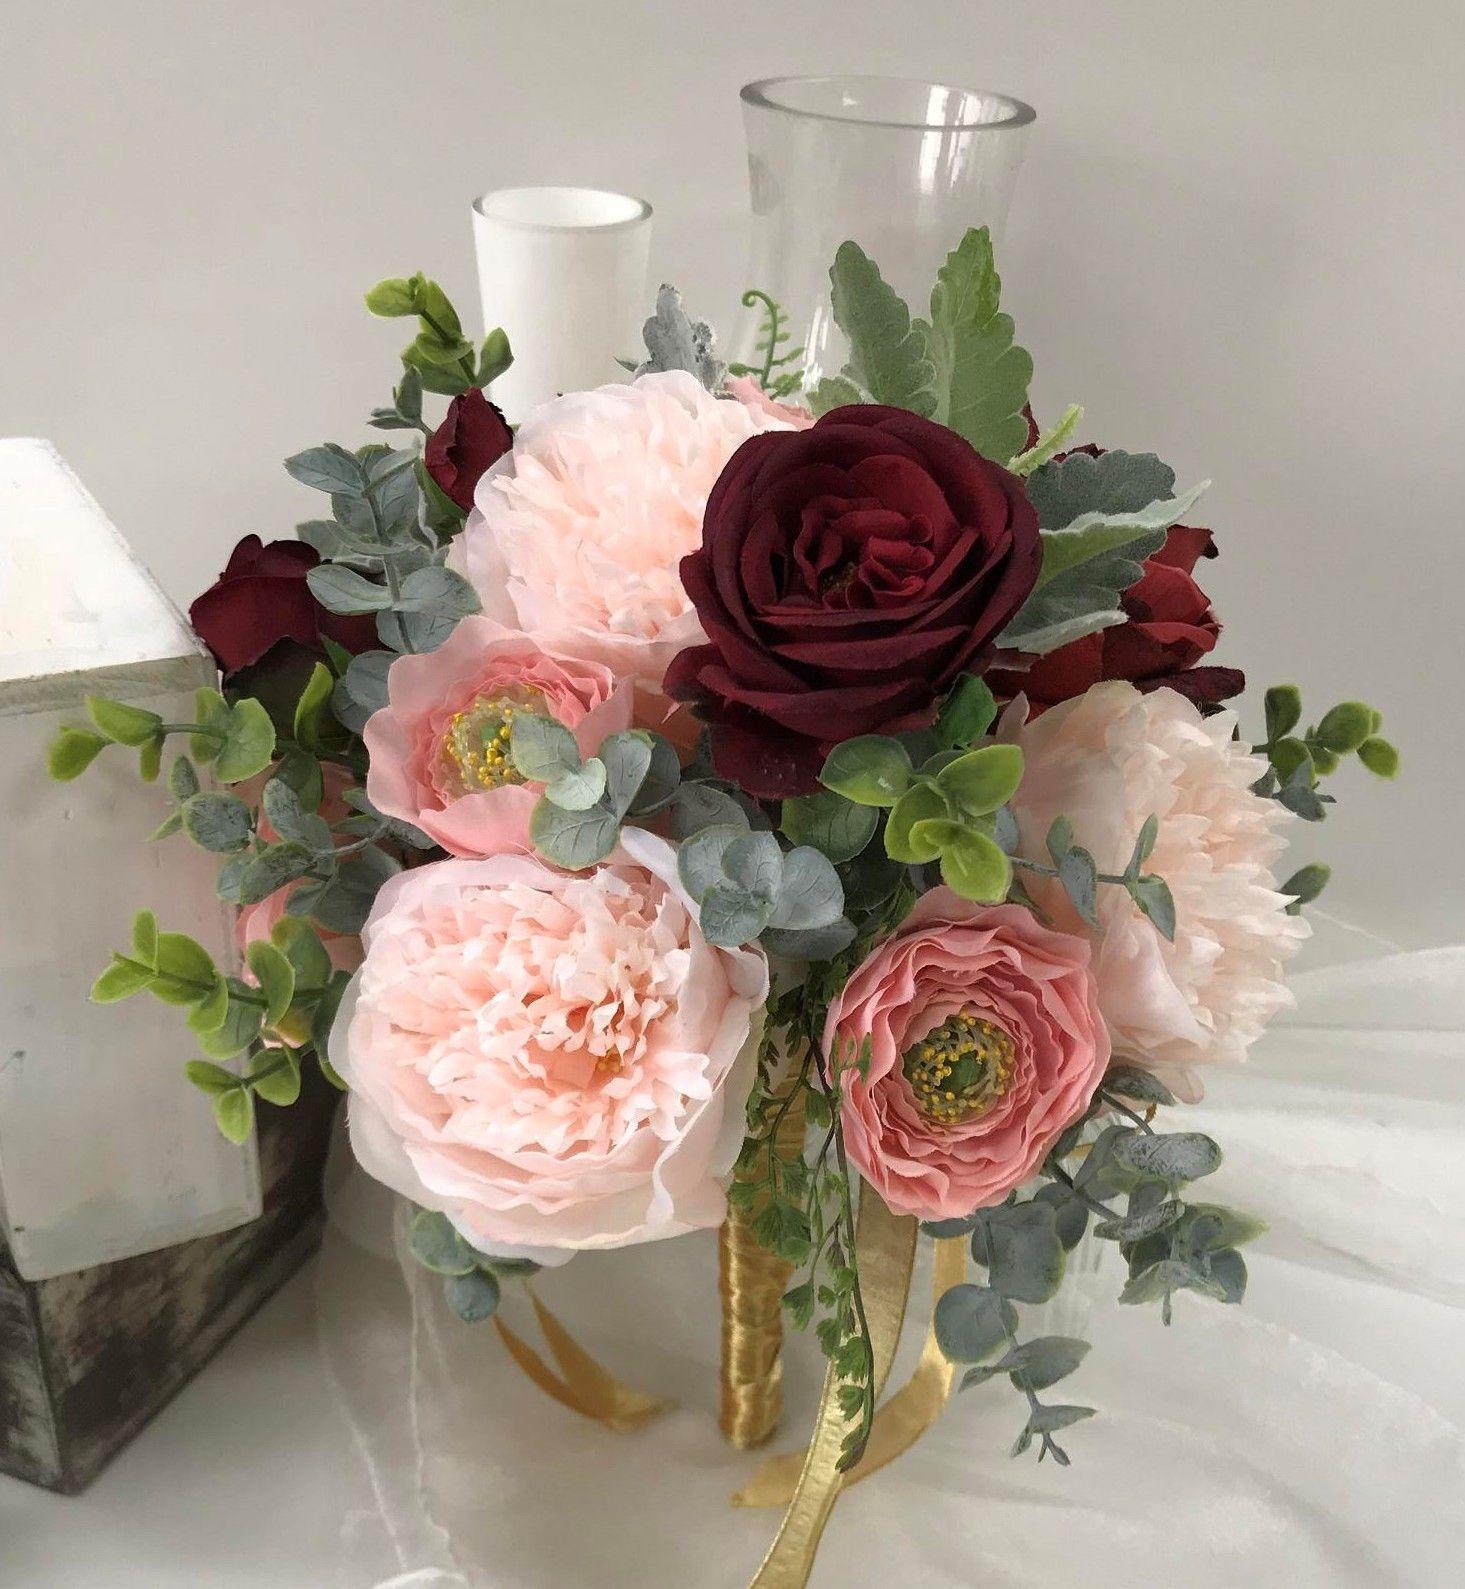 Silk Wedding Bouquet Vintage Dusty Pink Peony Roses Burgundy Green Flowers Fake Ebay Vintage Bouquet Wedding Silk Wedding Bouquets Fake Flower Centerpieces